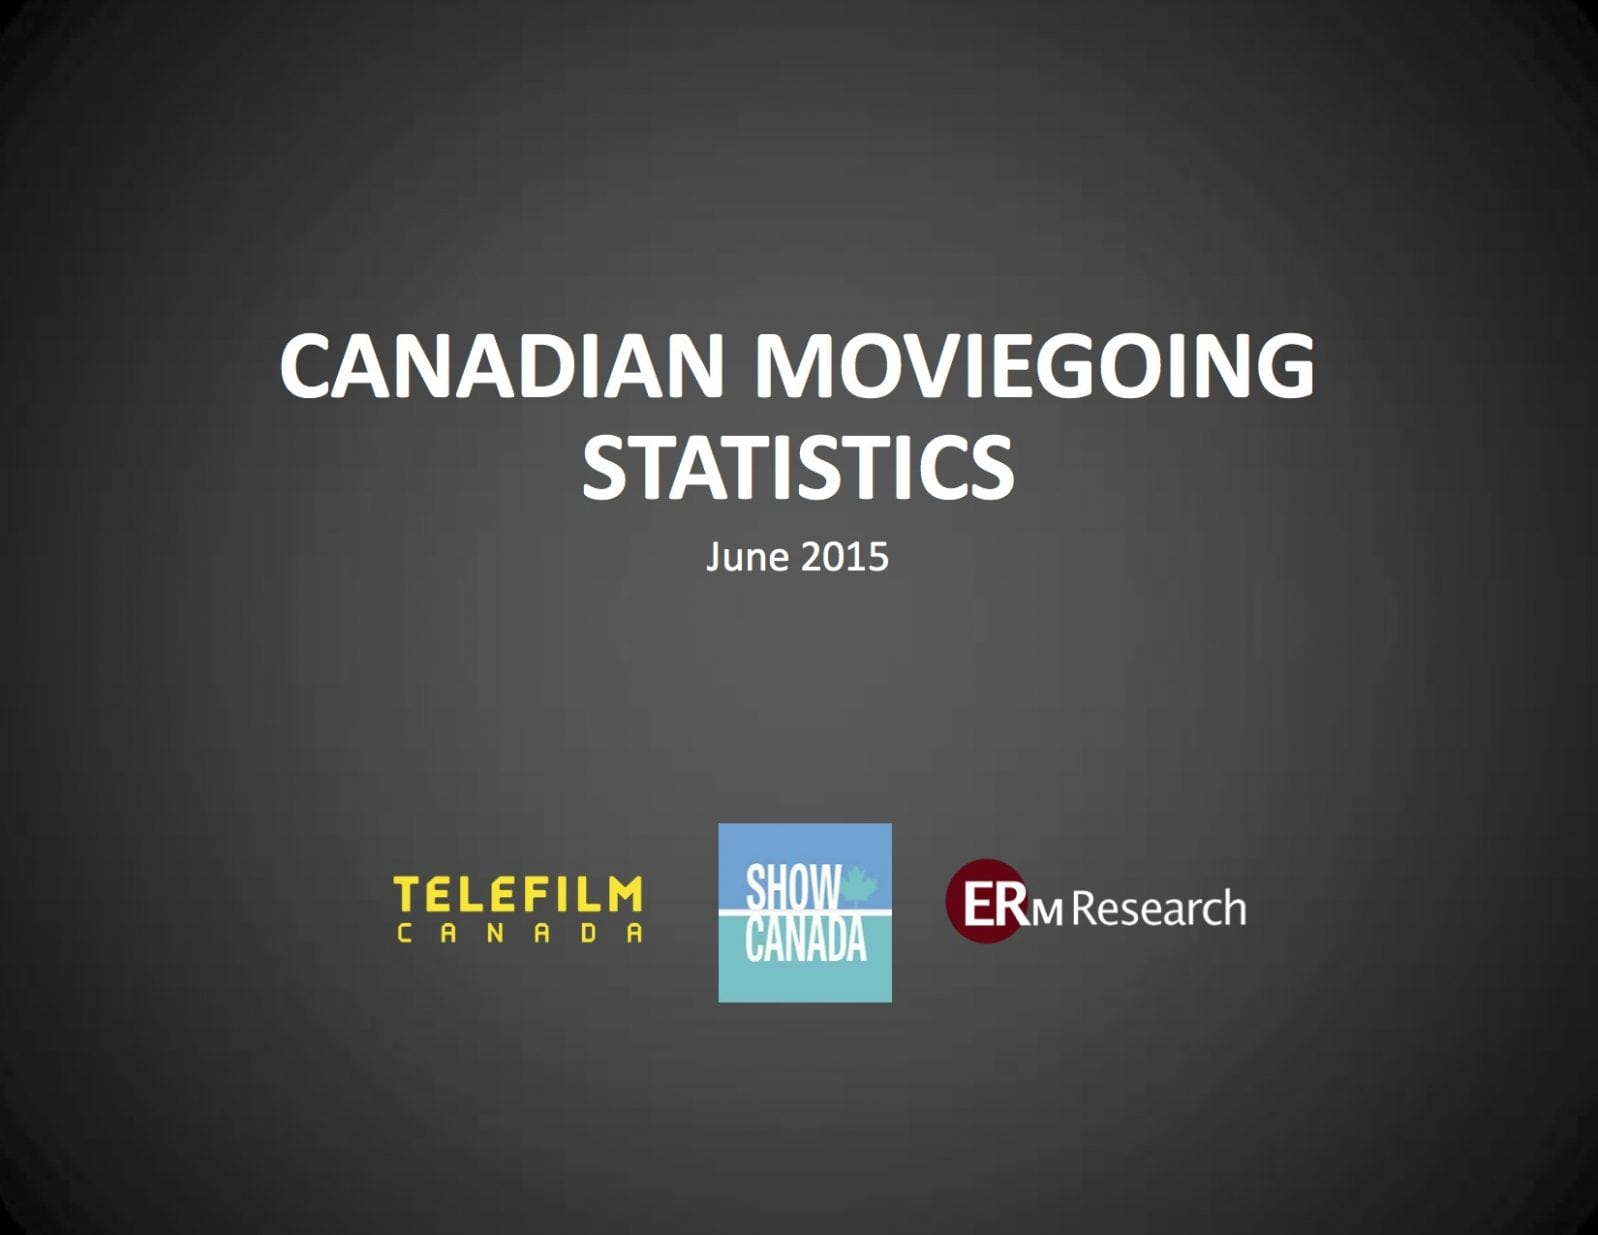 canada-moviegoing-statistics-june-2015